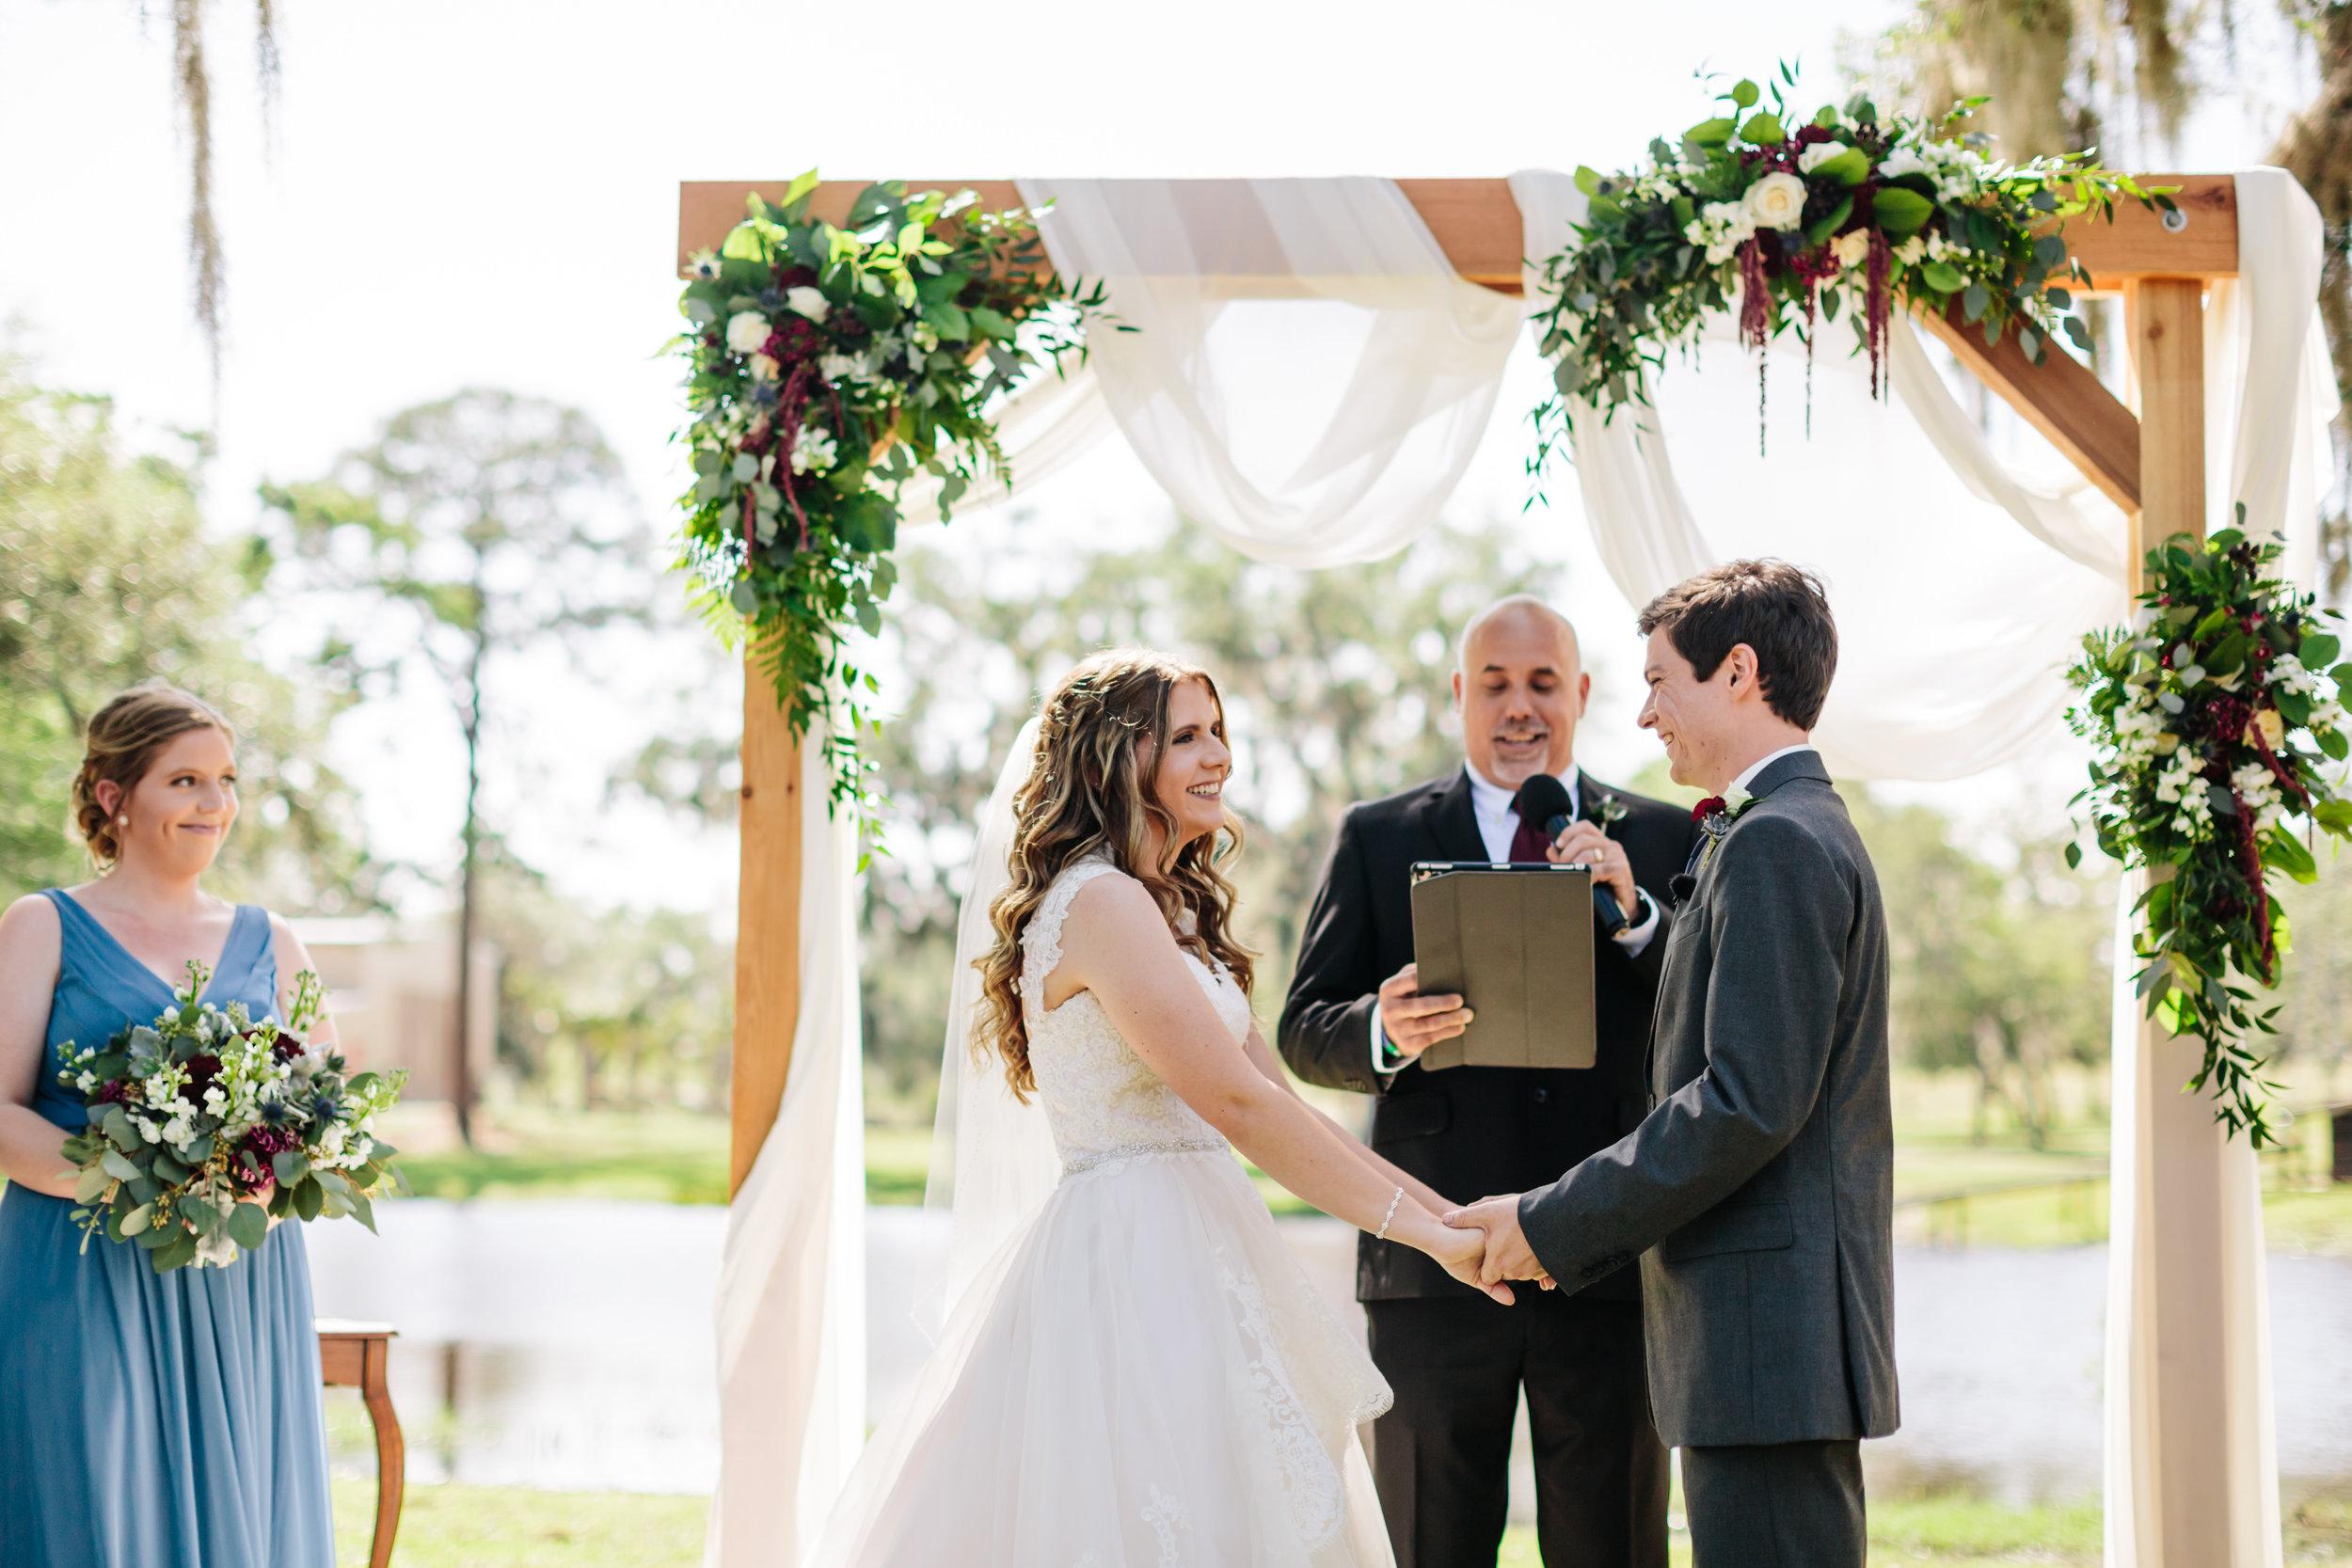 2018.04.14 Zak and Jamisyn Unrue Black Willow Barn Wedding Finals-352.jpg